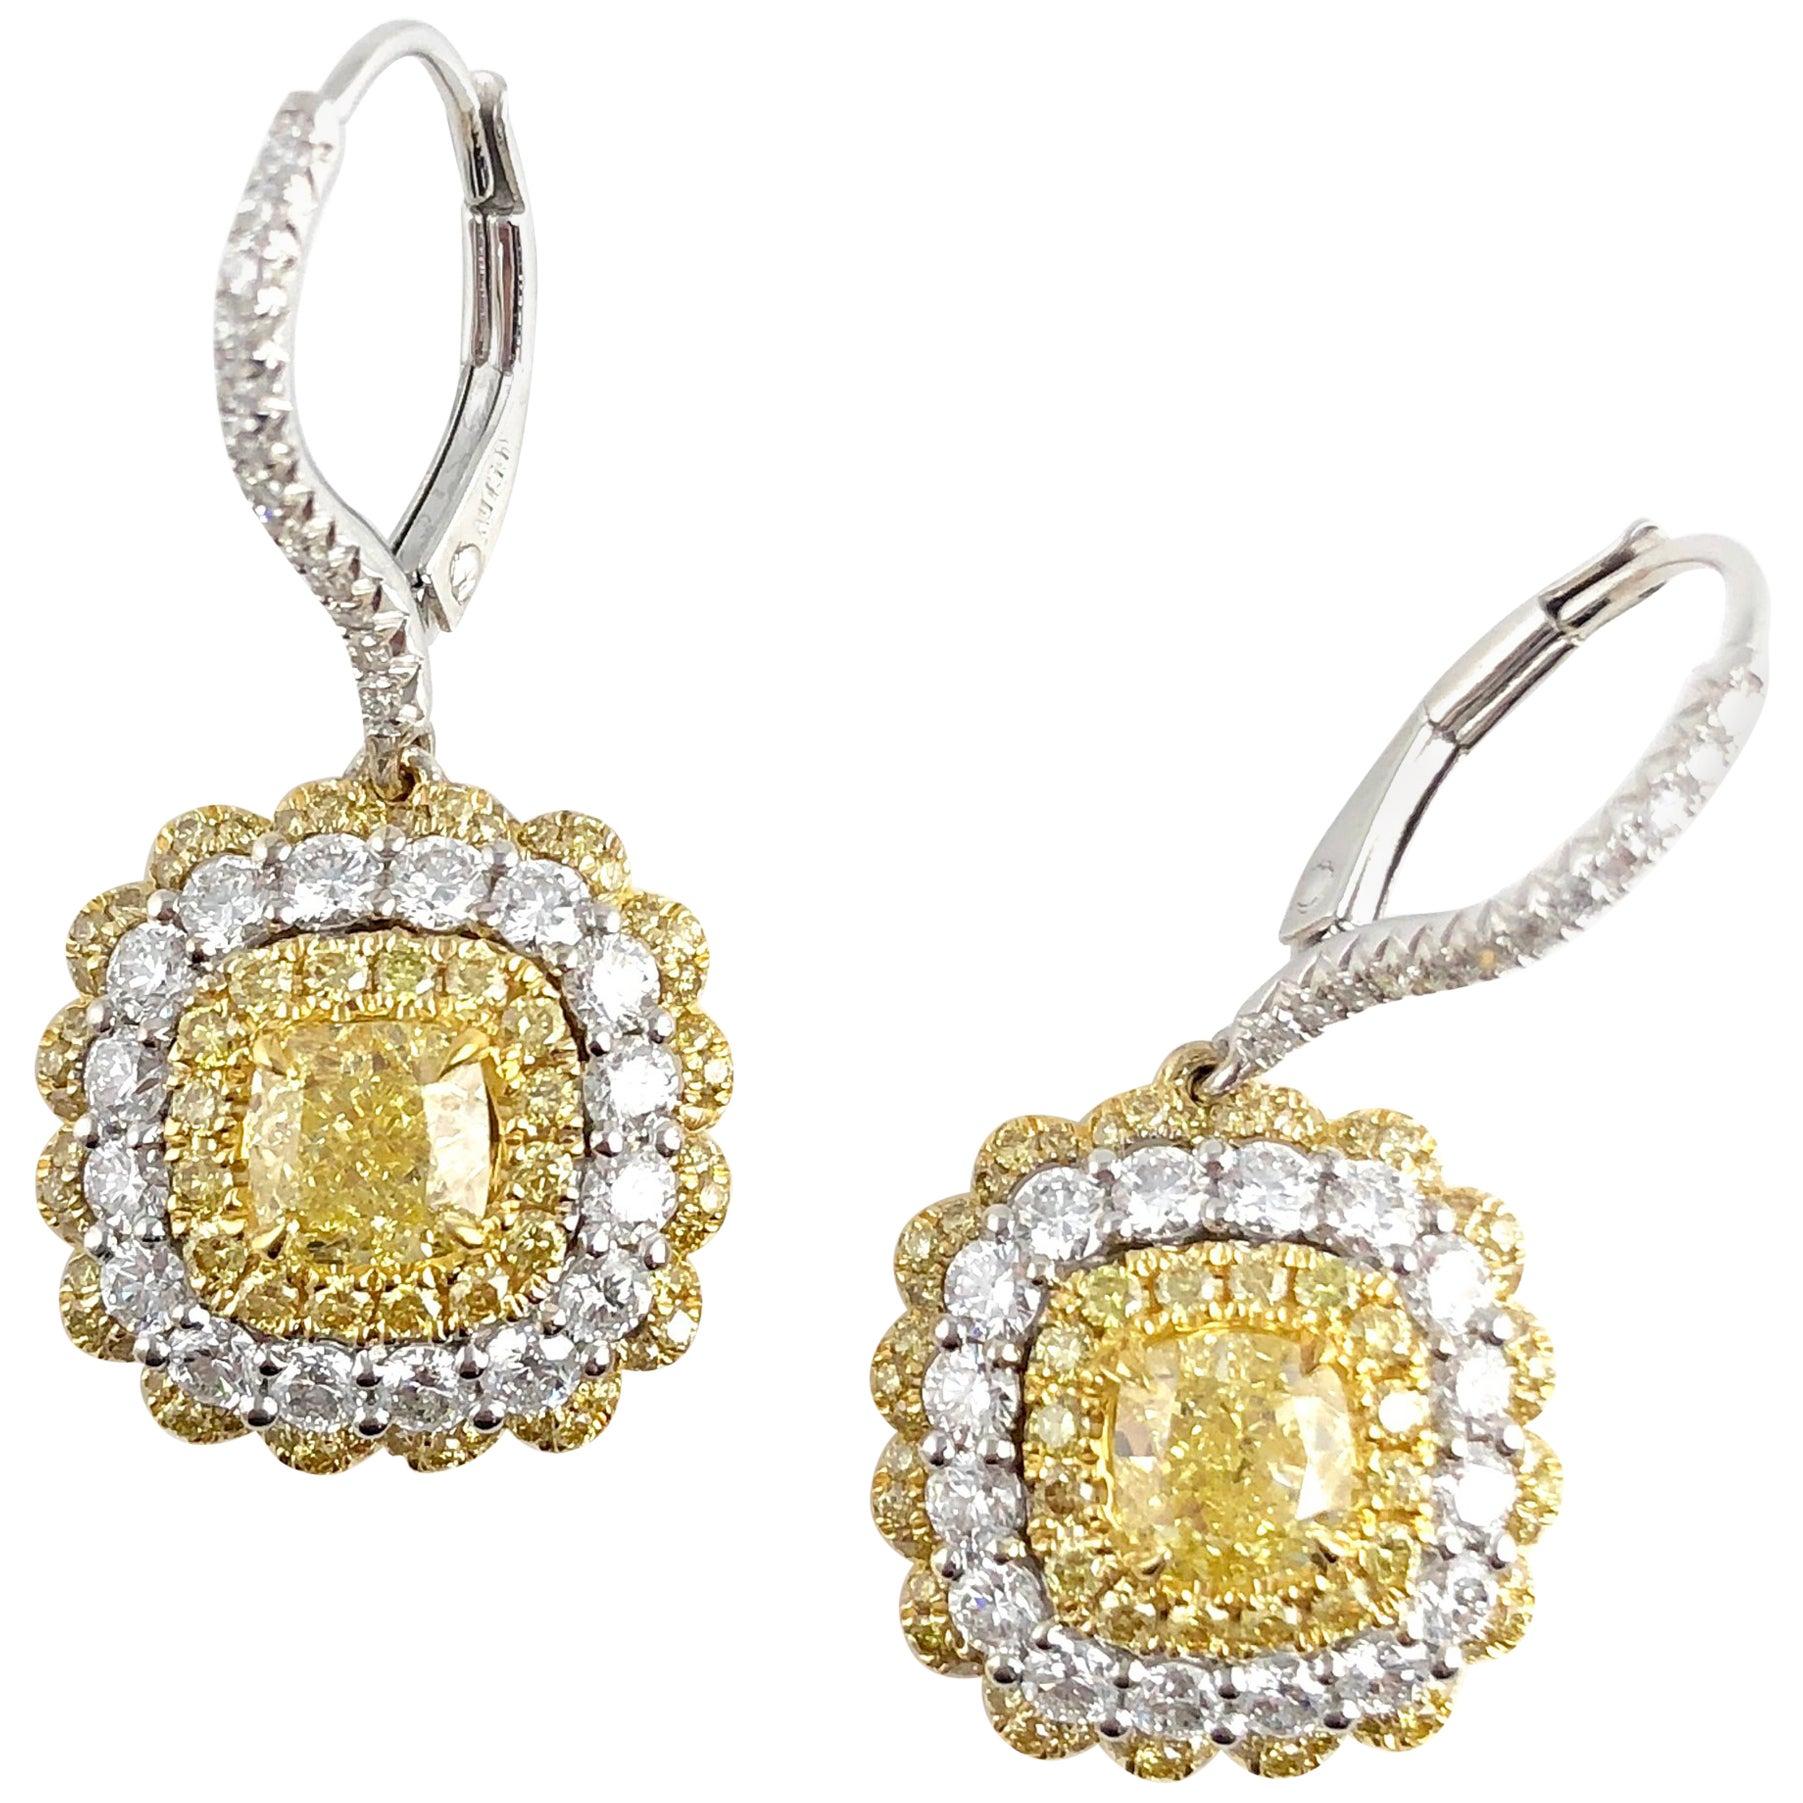 DiamondTown GIA Certified 1.30 Carat Natural Fancy Yellow Diamond Lever-Back